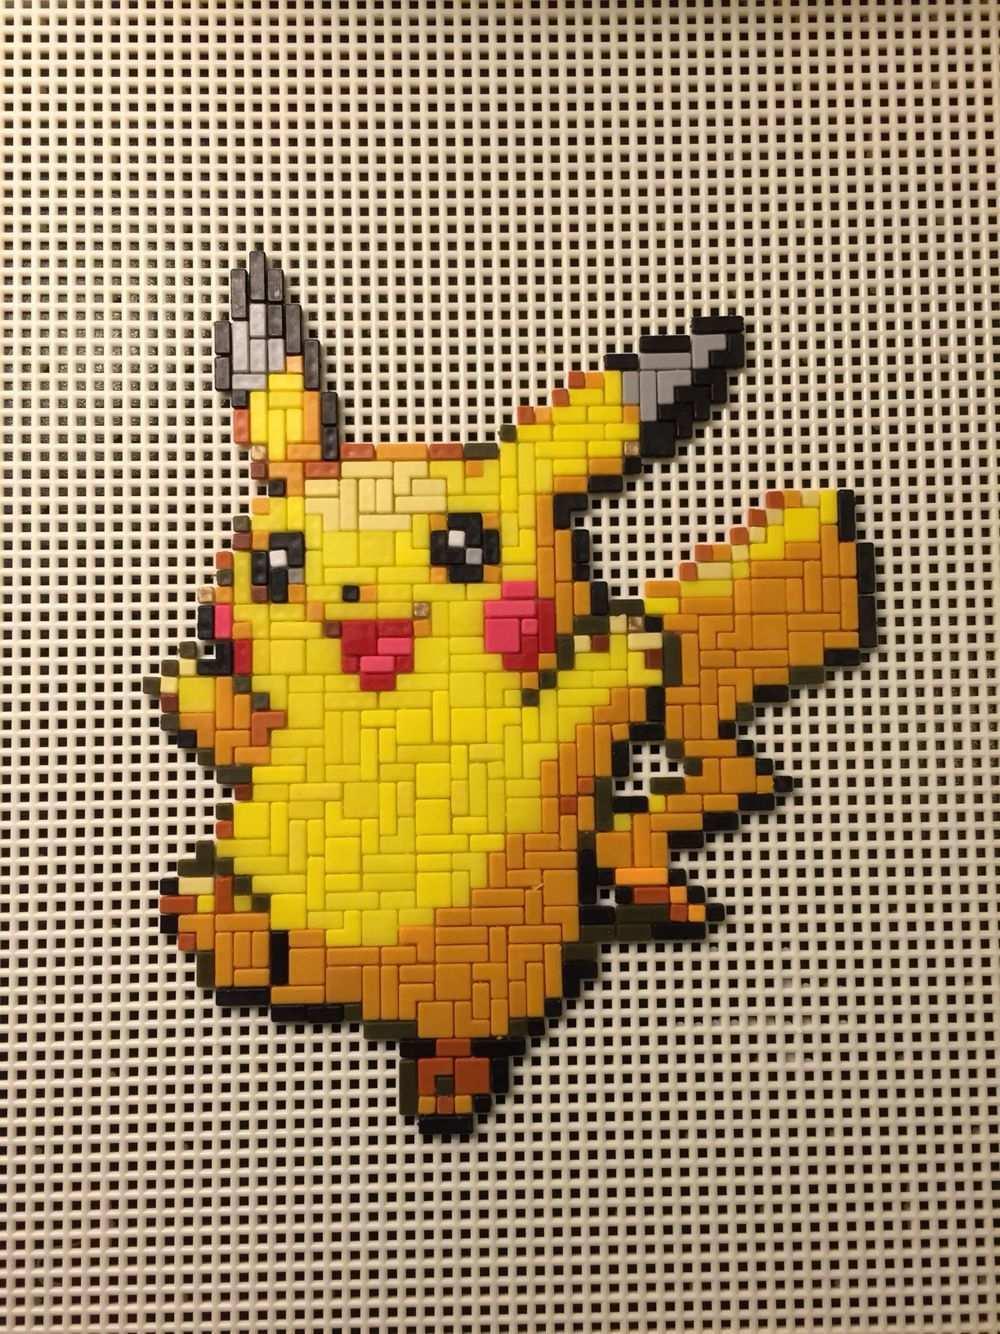 Ministeck Mario Google Zoeken In 2020 Pokemon Afbeeldingen Pikachu Leuke Knutselwerken